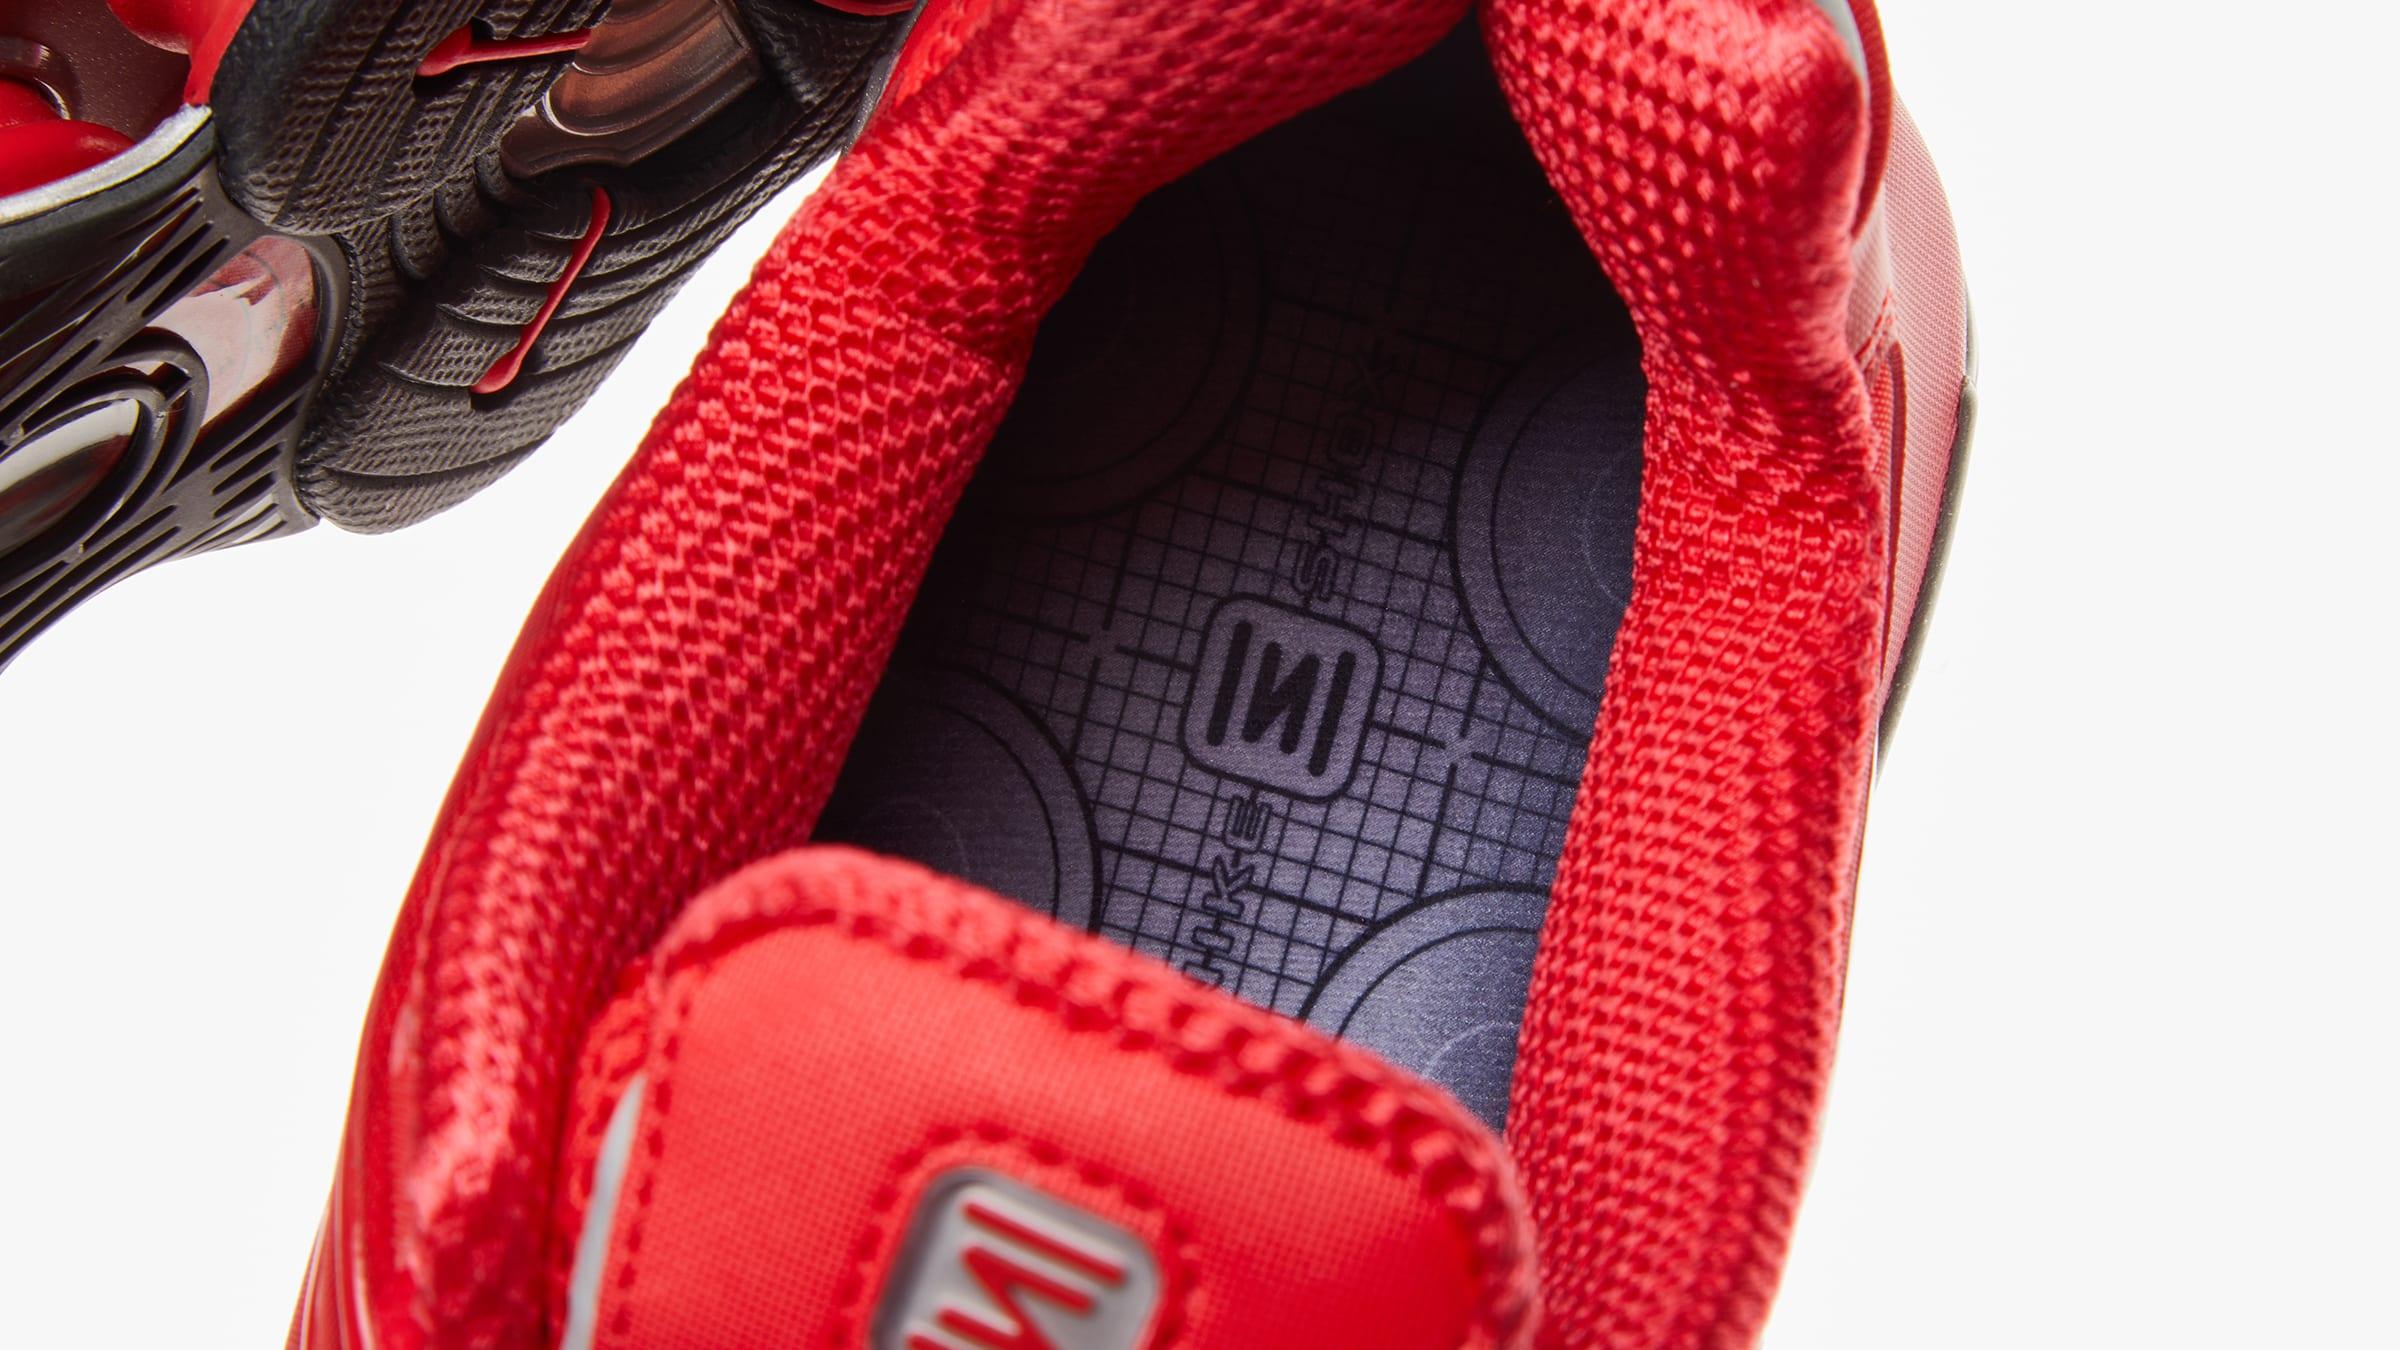 70beb73853eea Nike Shox TL. Speed Red & Metallic Silver£149. Recalling their  revolutionary status from a bygone era